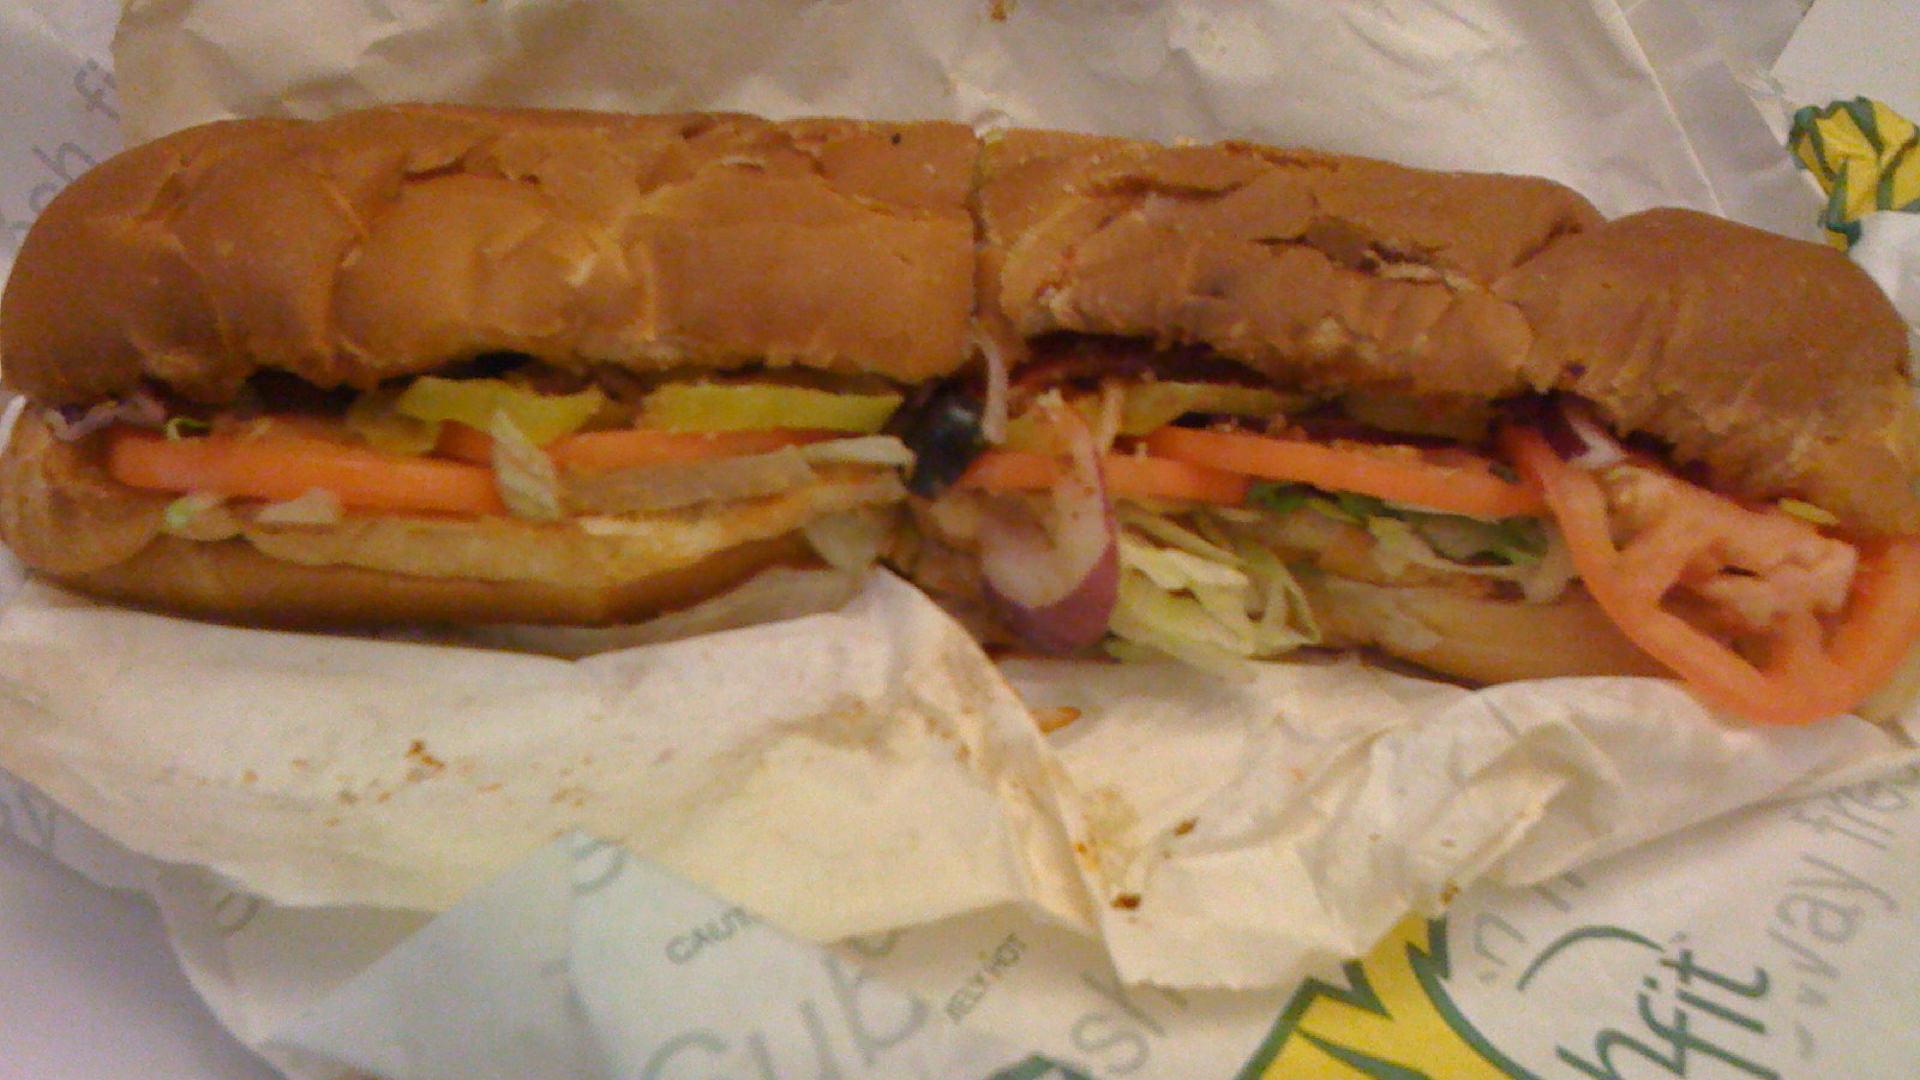 Another Lifeless Subway Sandwich